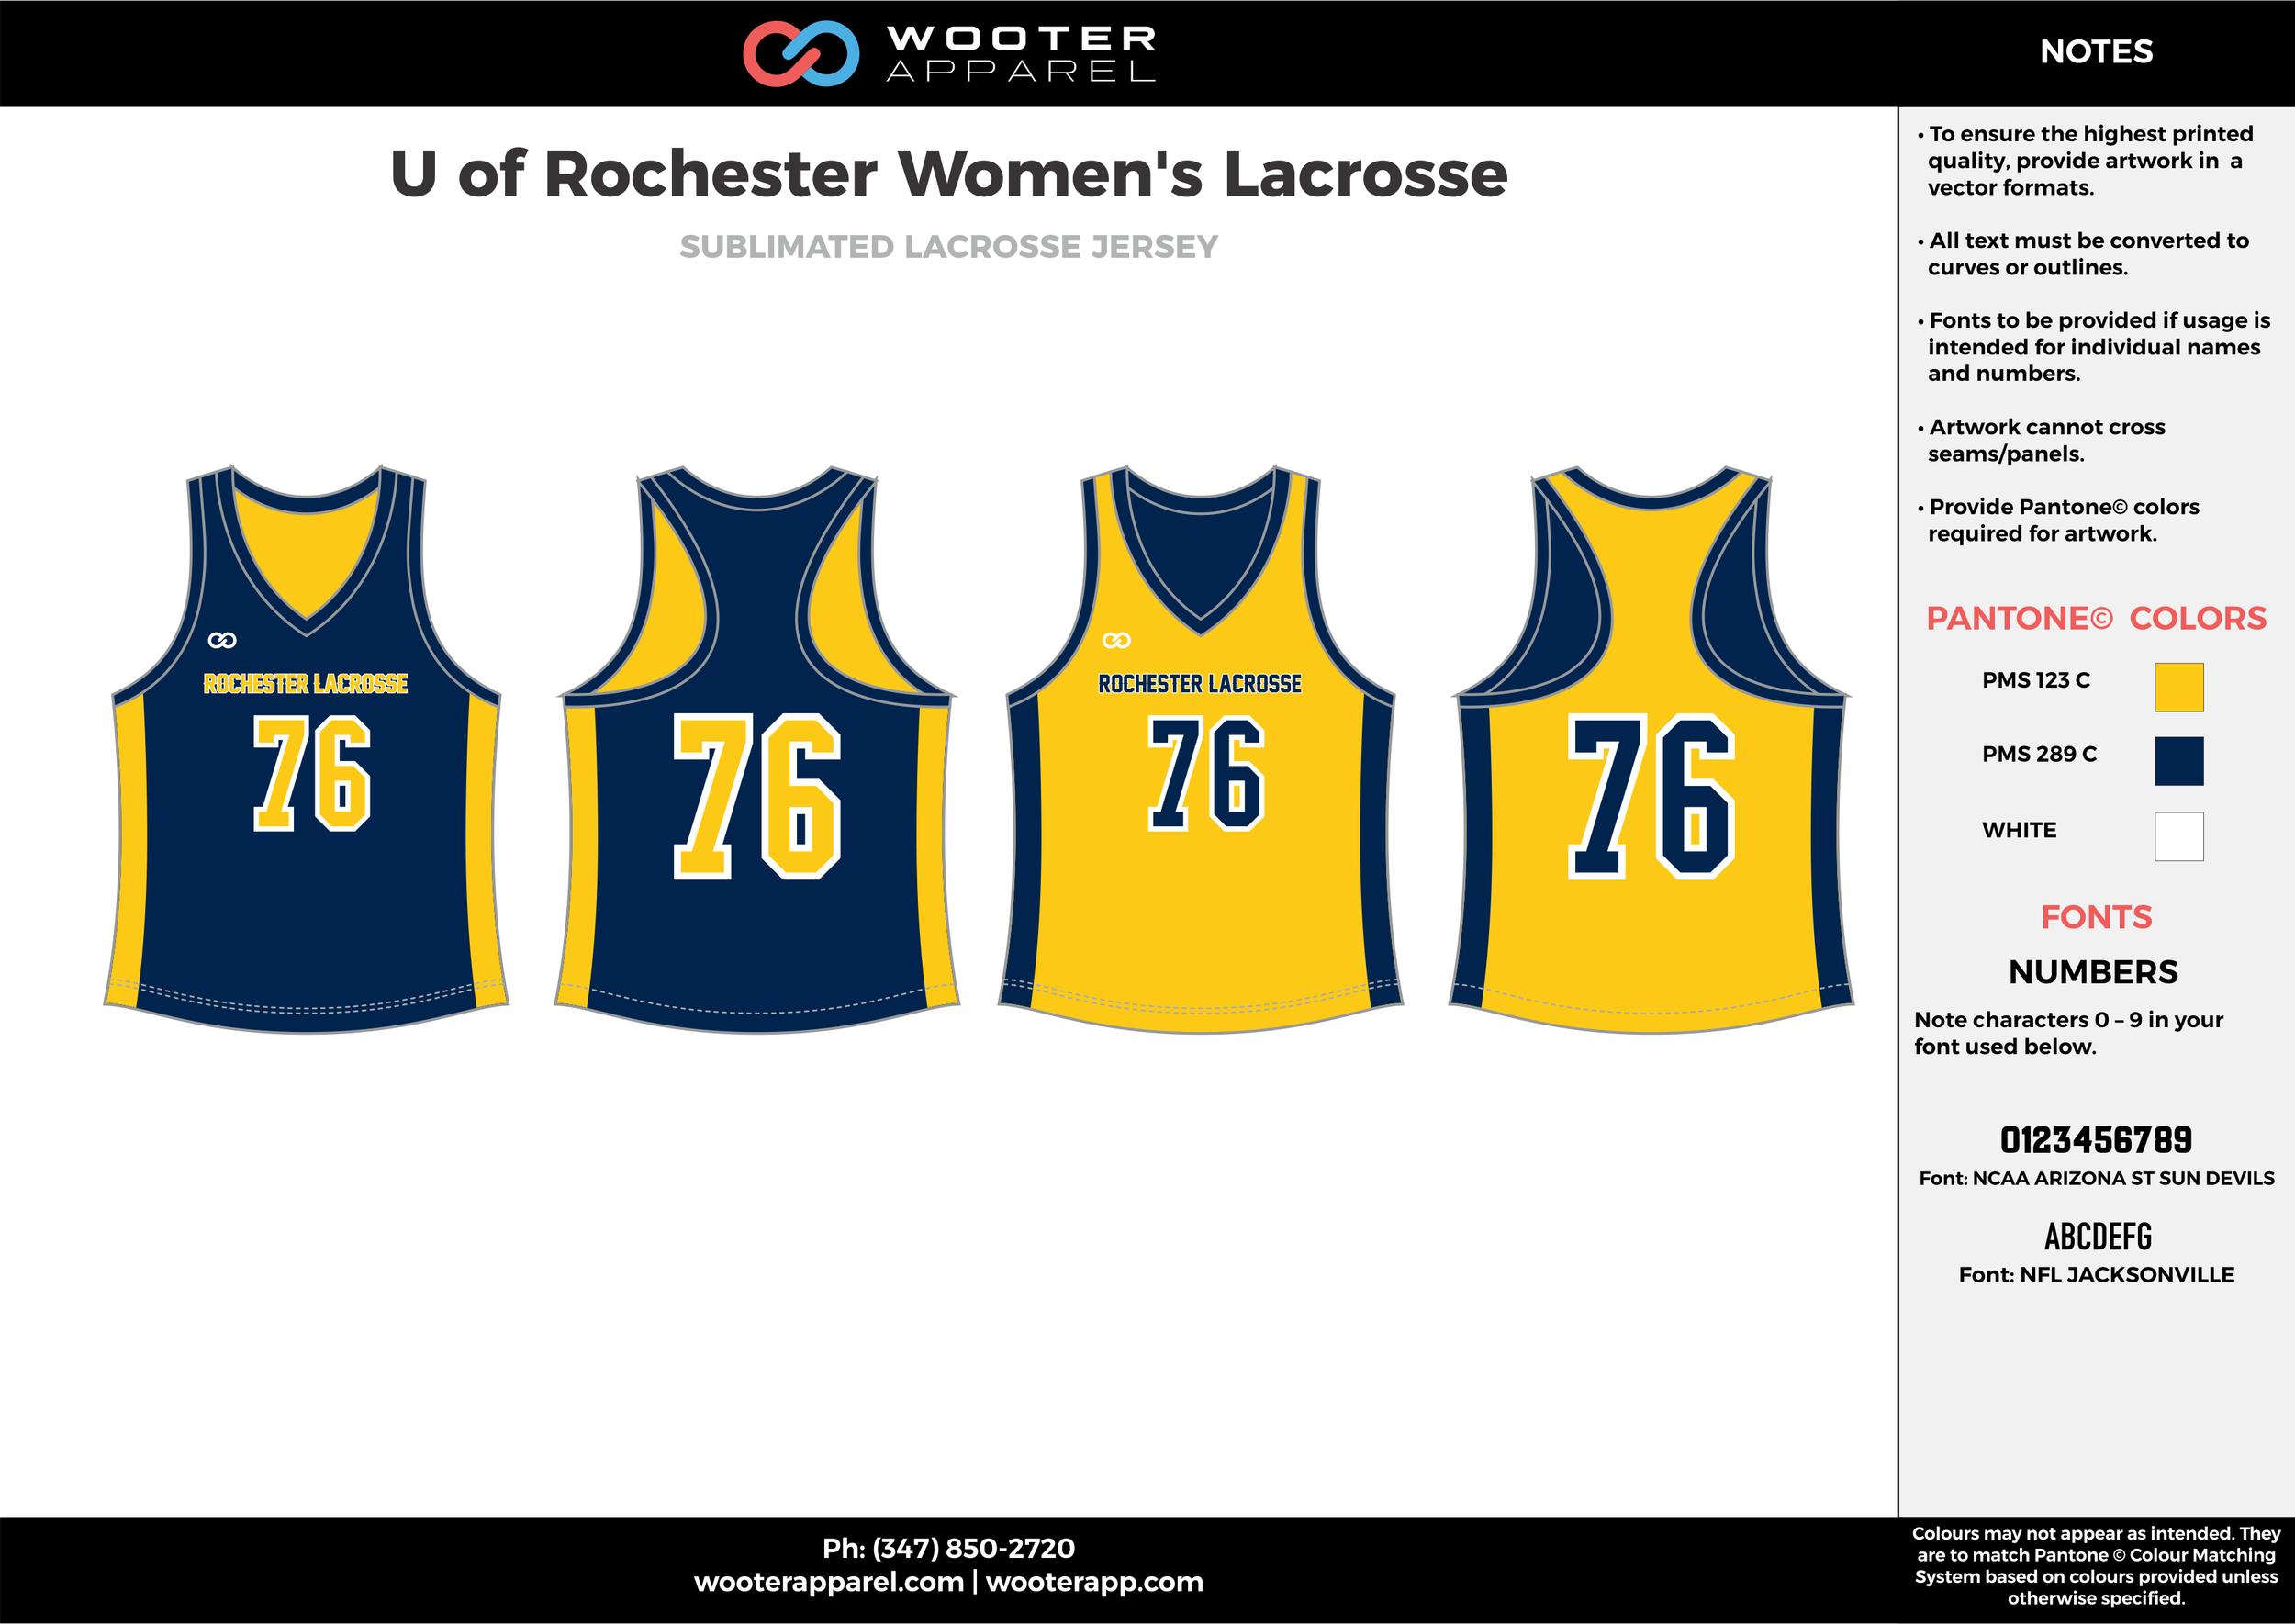 U of Rochester Women's Lacrosse yellow navy blue white Lacrosse uniforms reversible pinnies jerseys